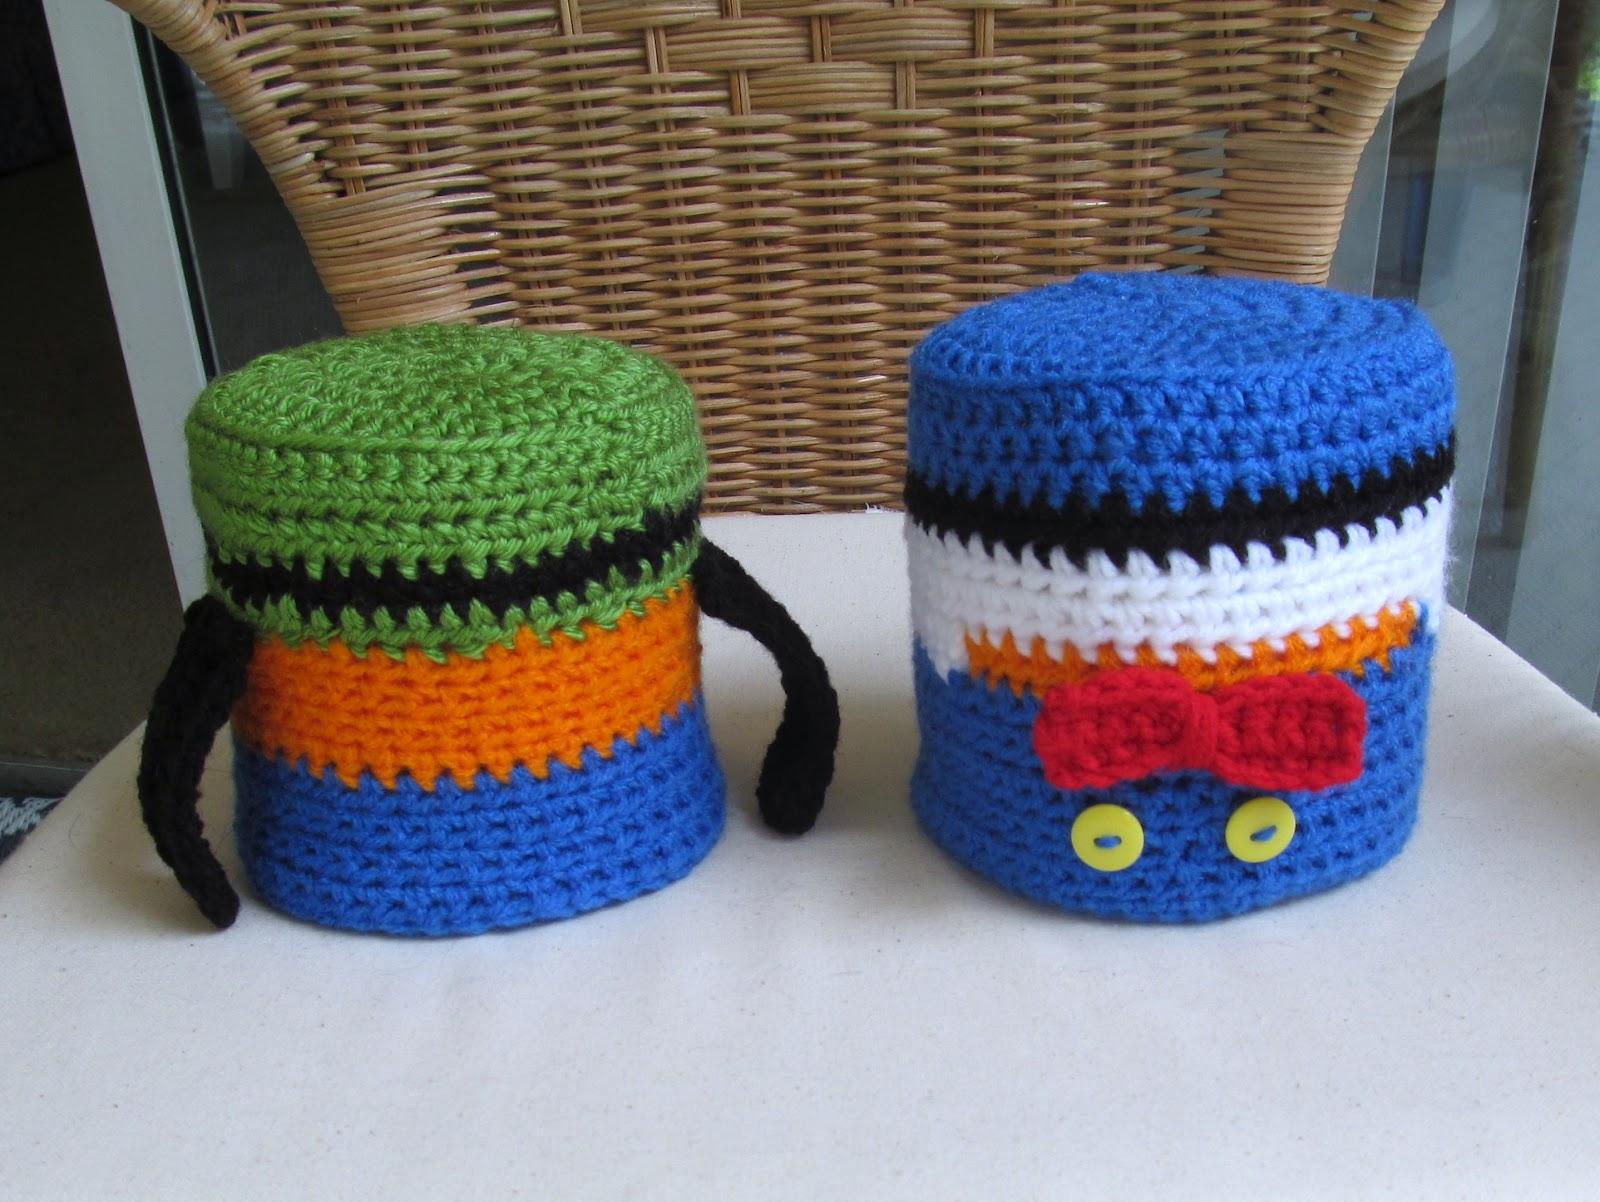 Tampa Bay Crochet: Latest Custom Crochet Projects